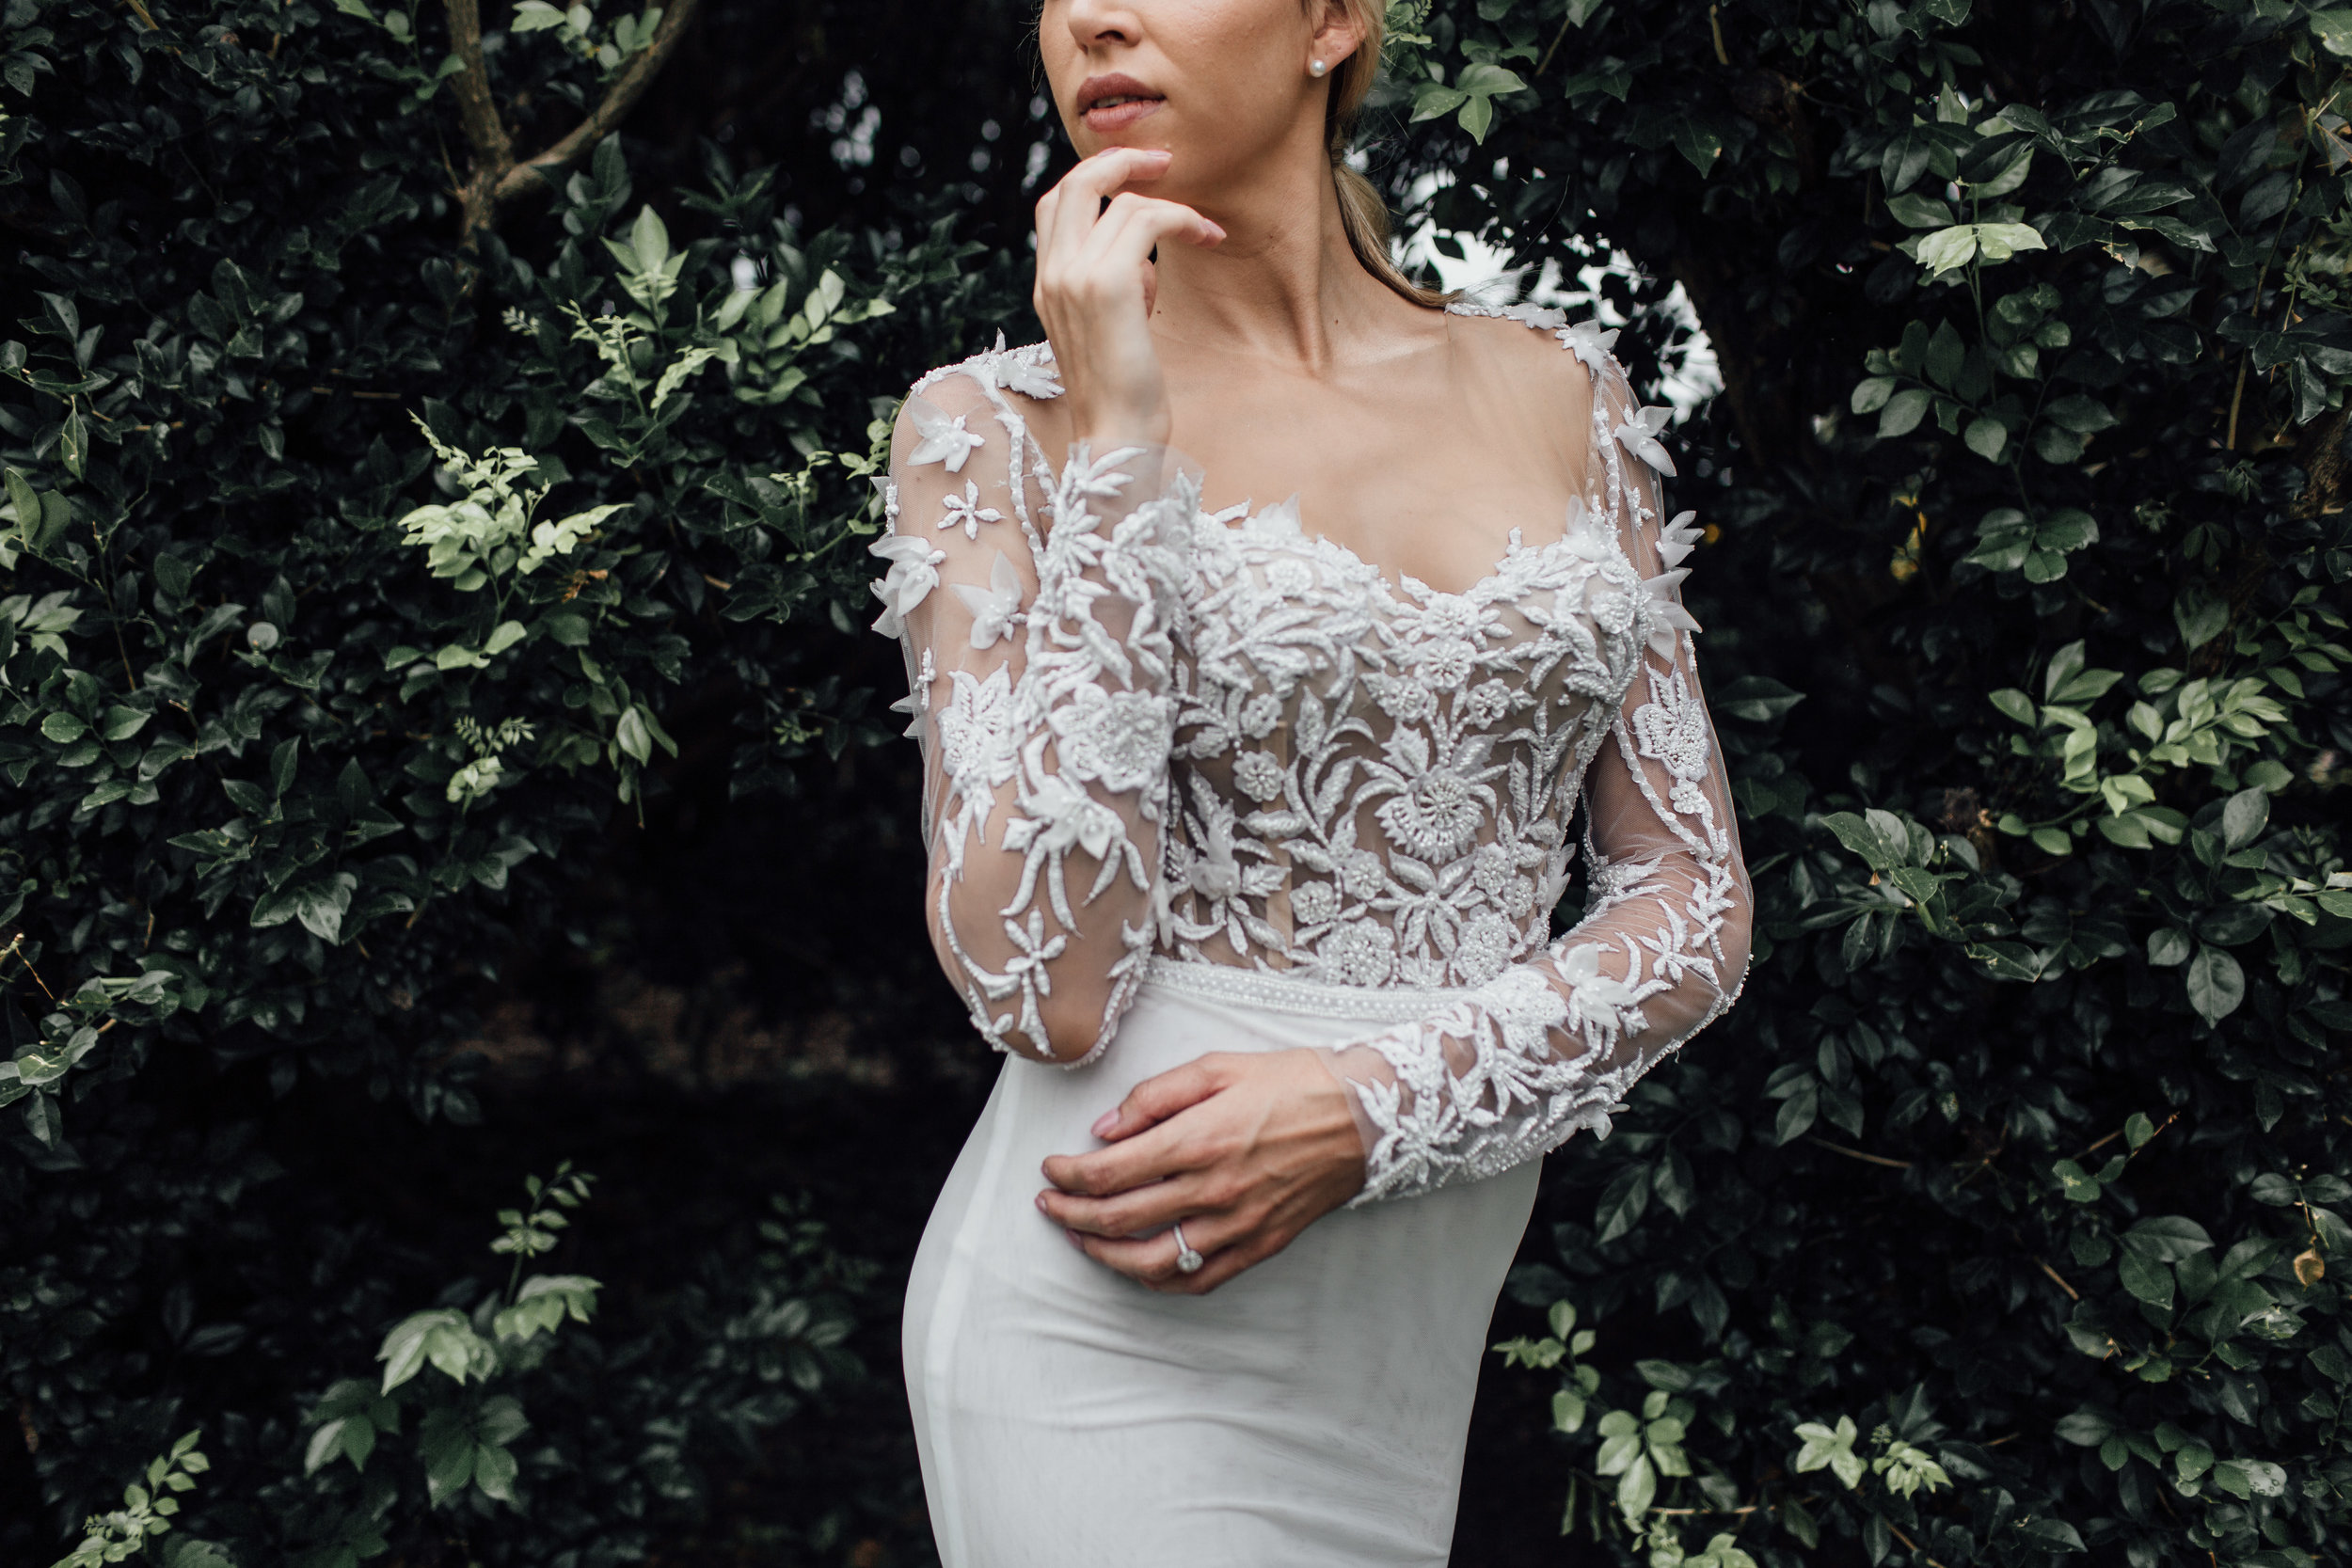 Ivonn-Couture-Eden-Couture-Collection-112.jpg